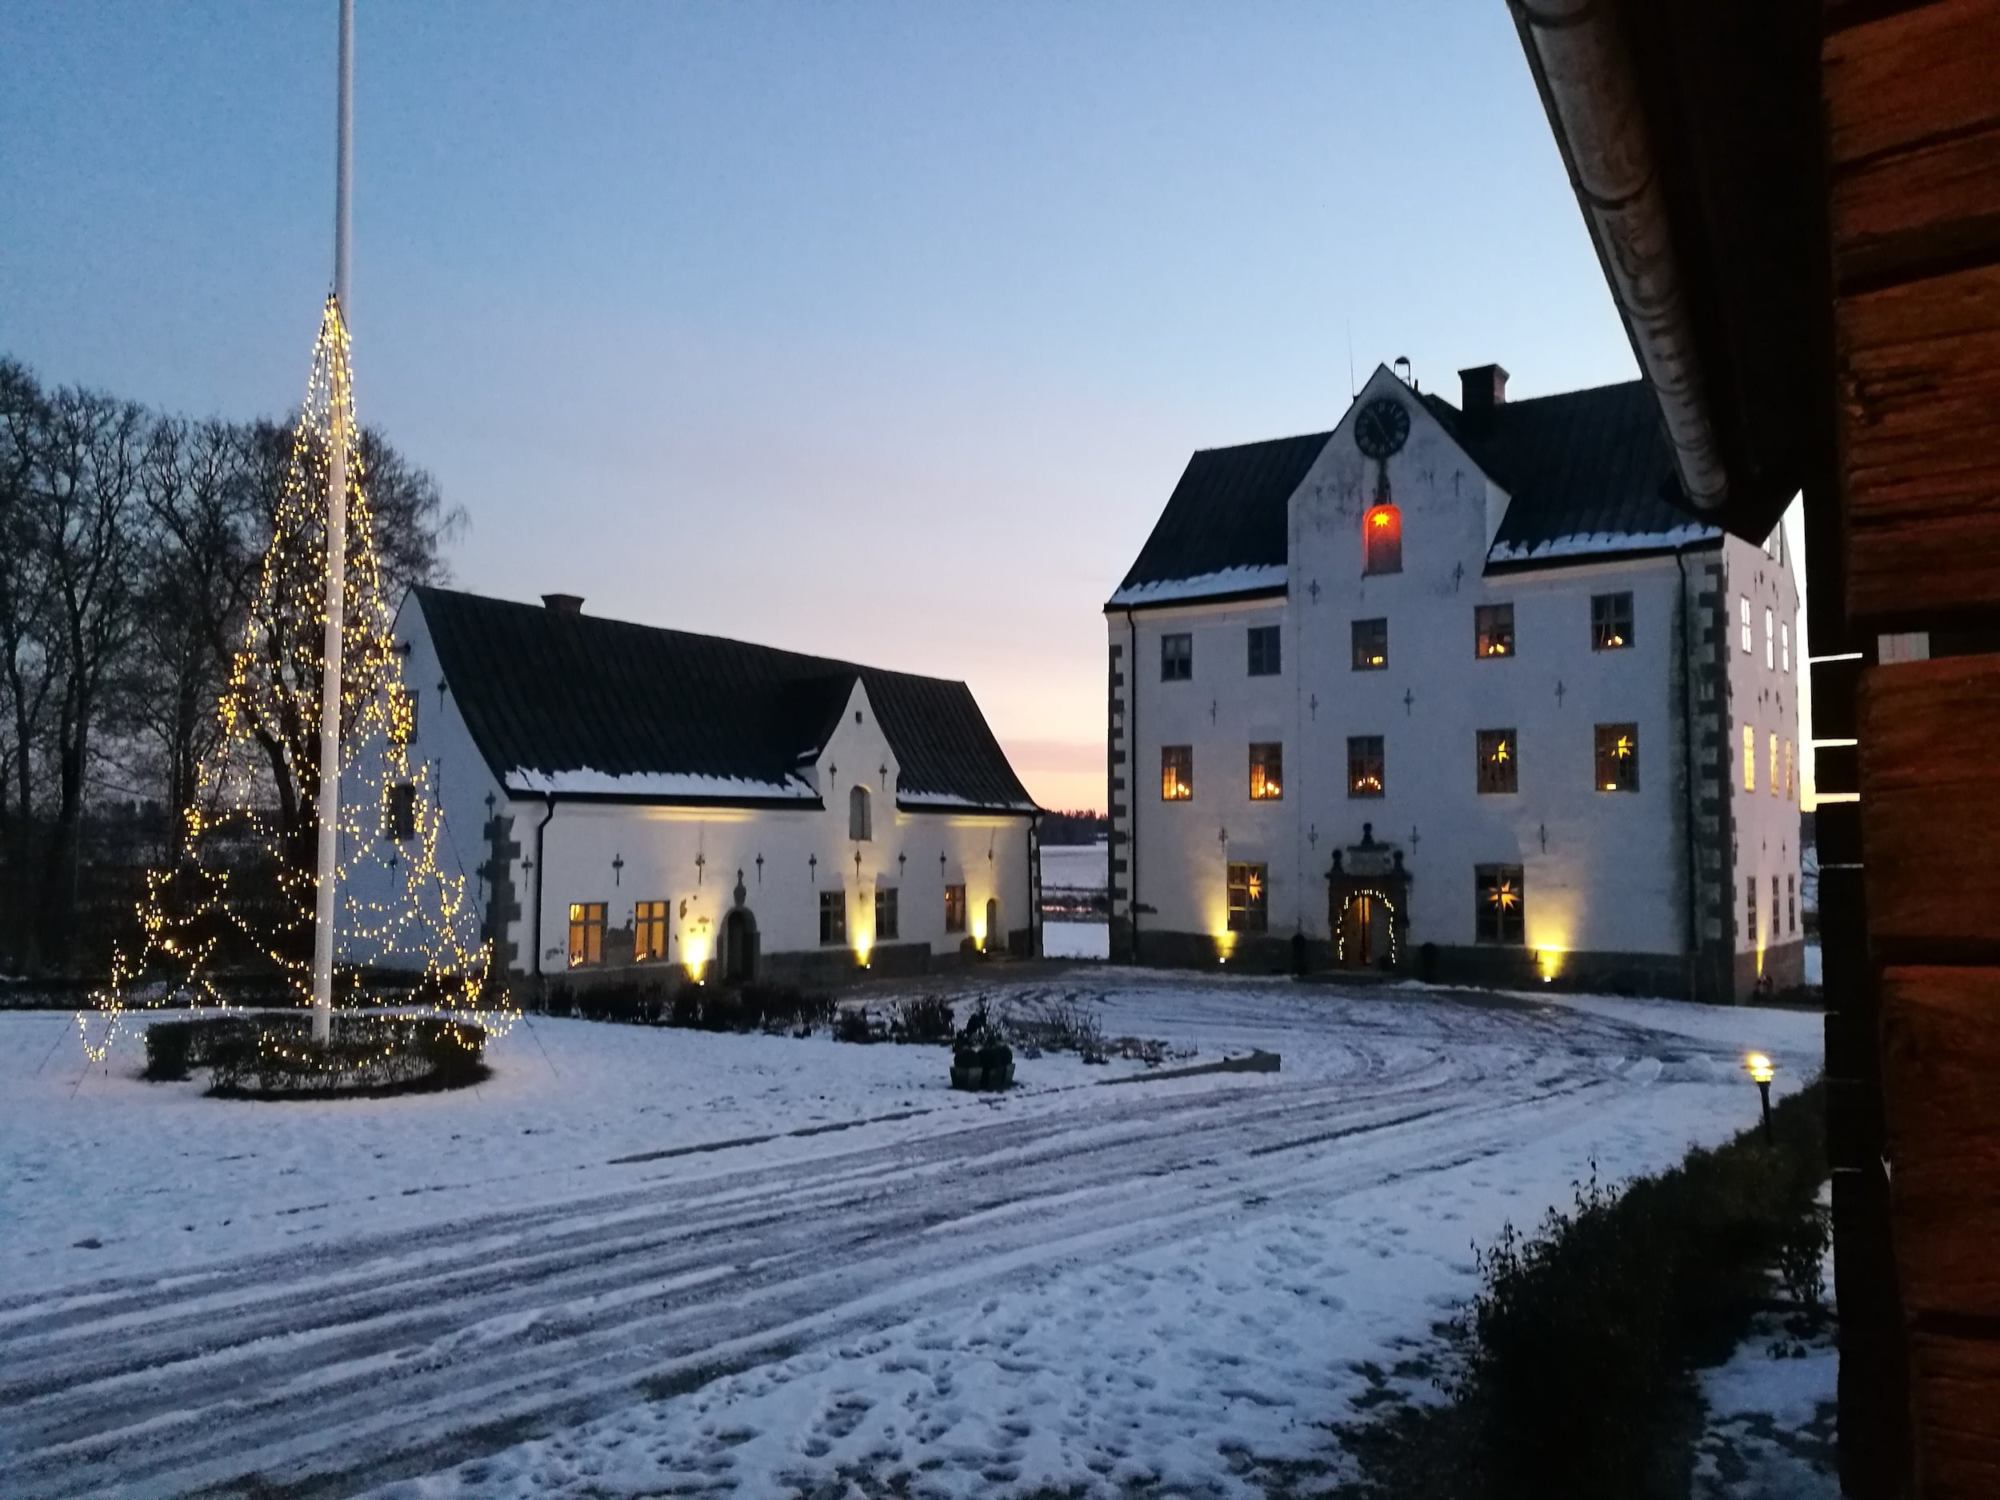 Salnecke Christmas market